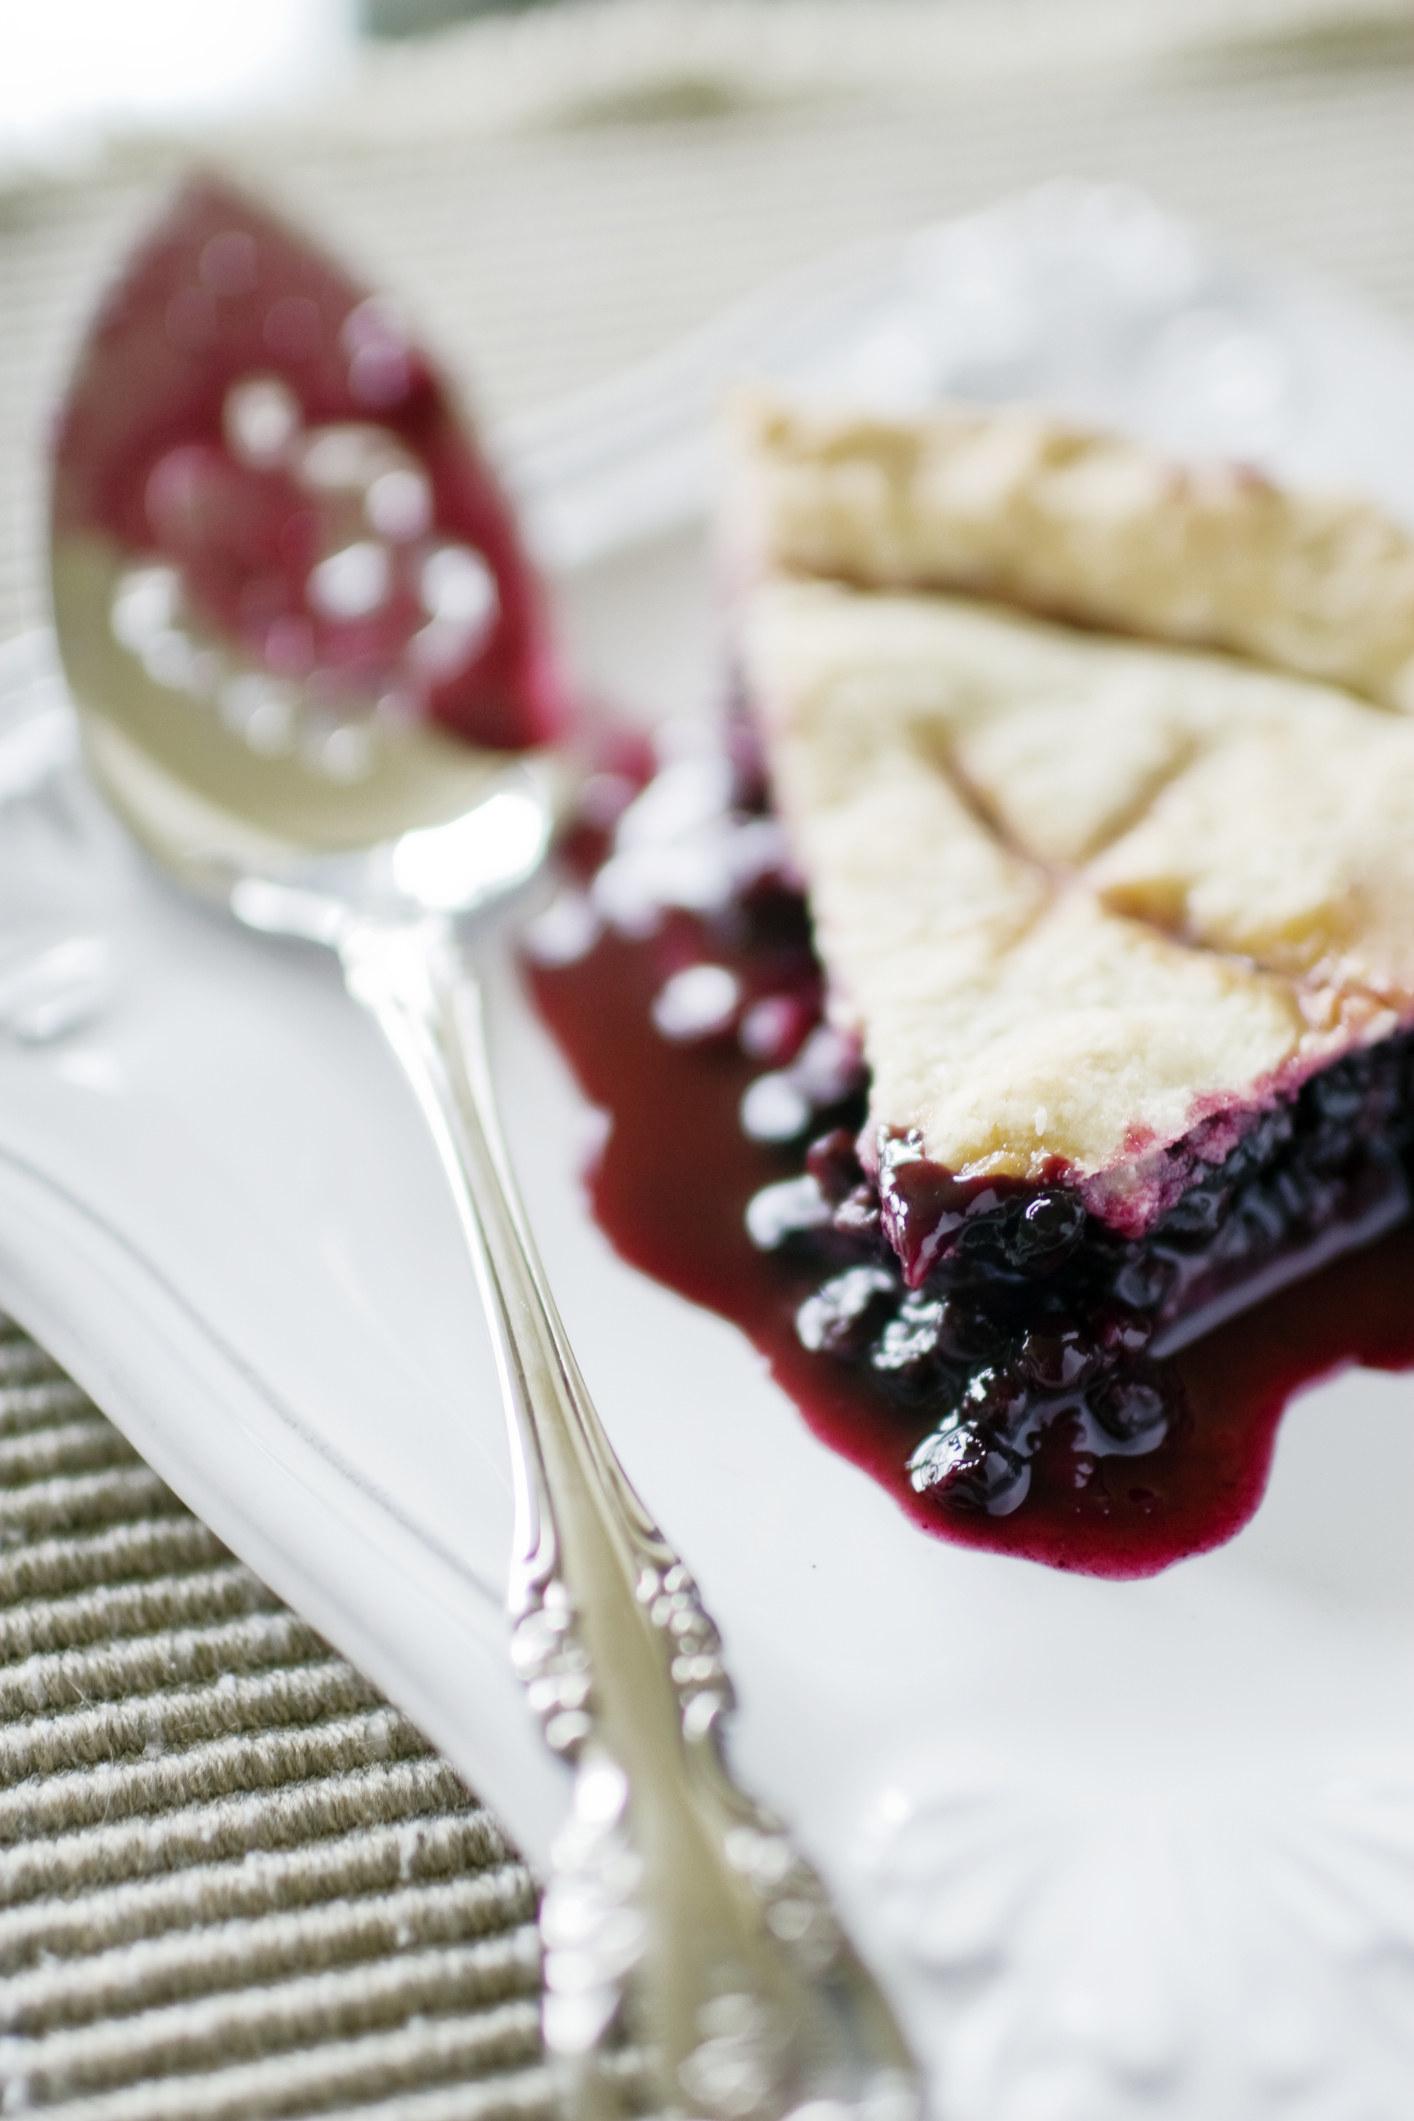 A slice of huckleberry pie.